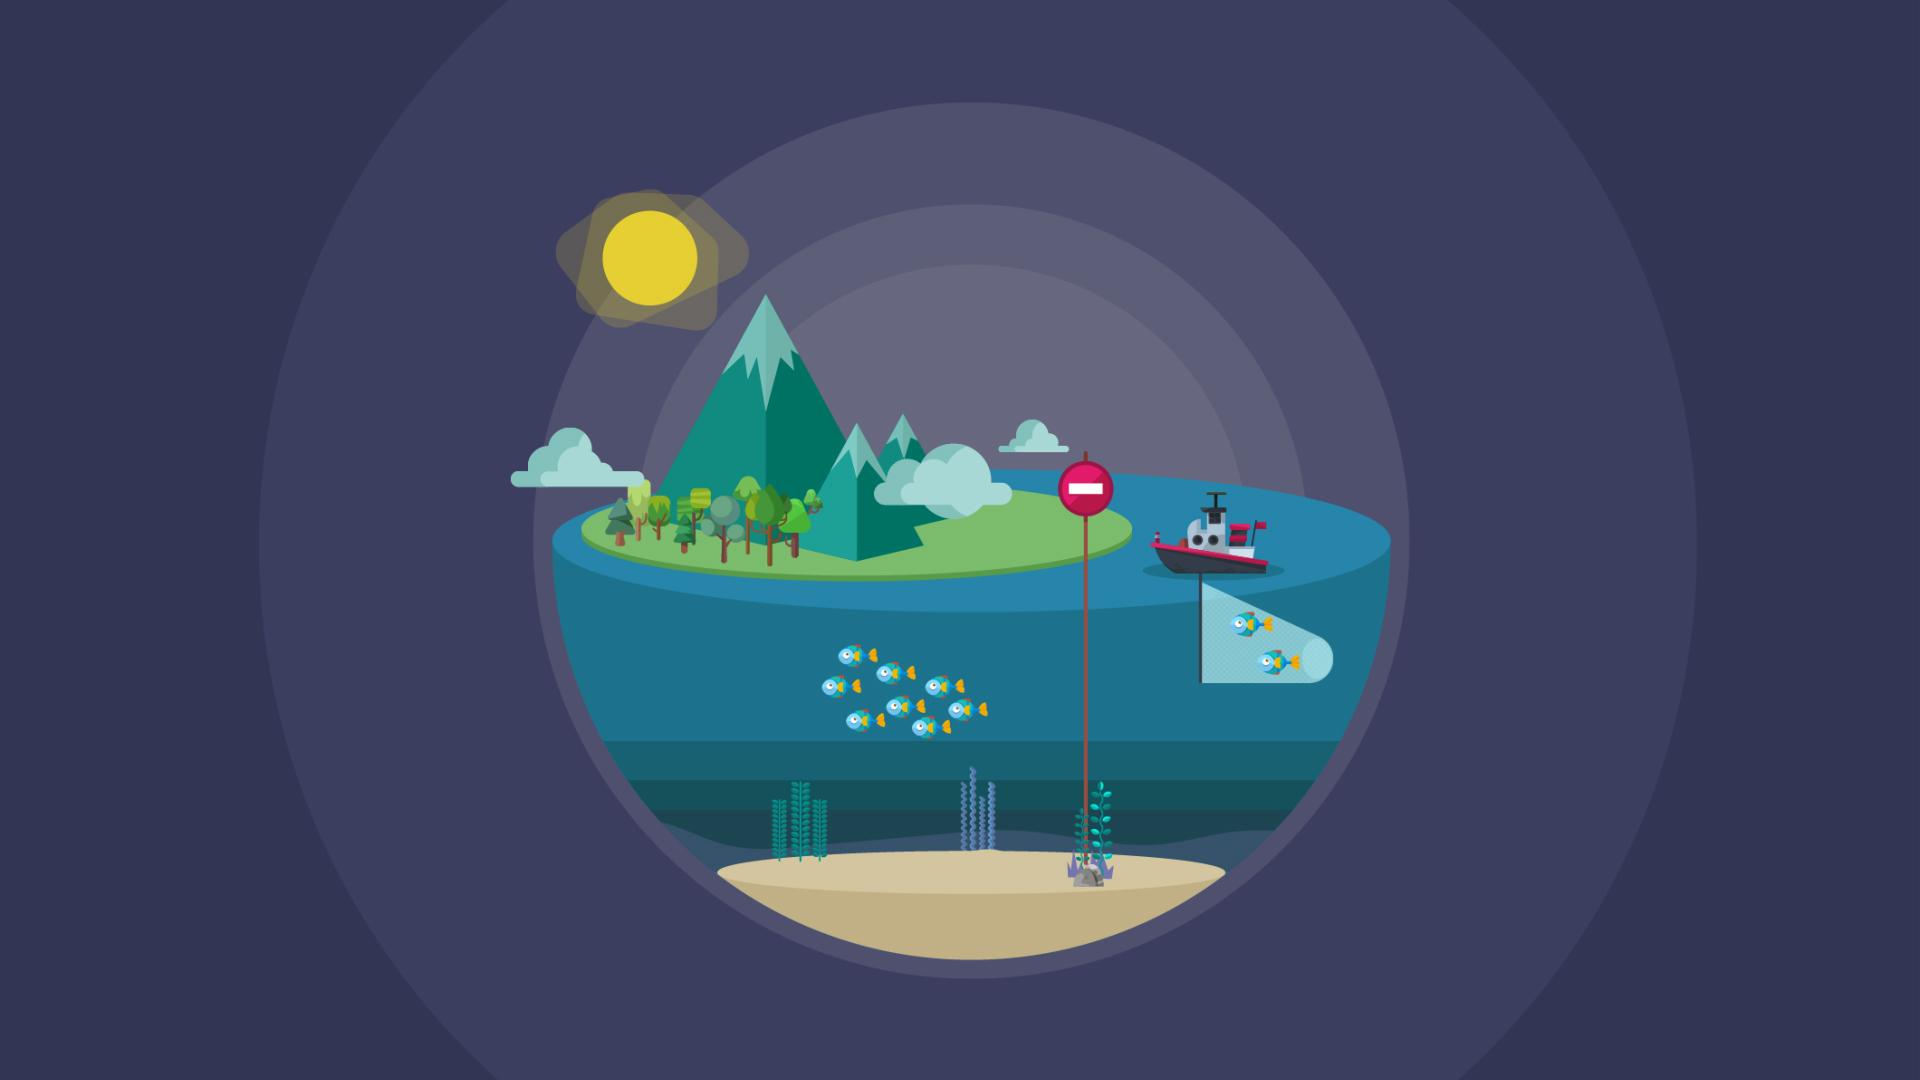 Human impact on ecosystems